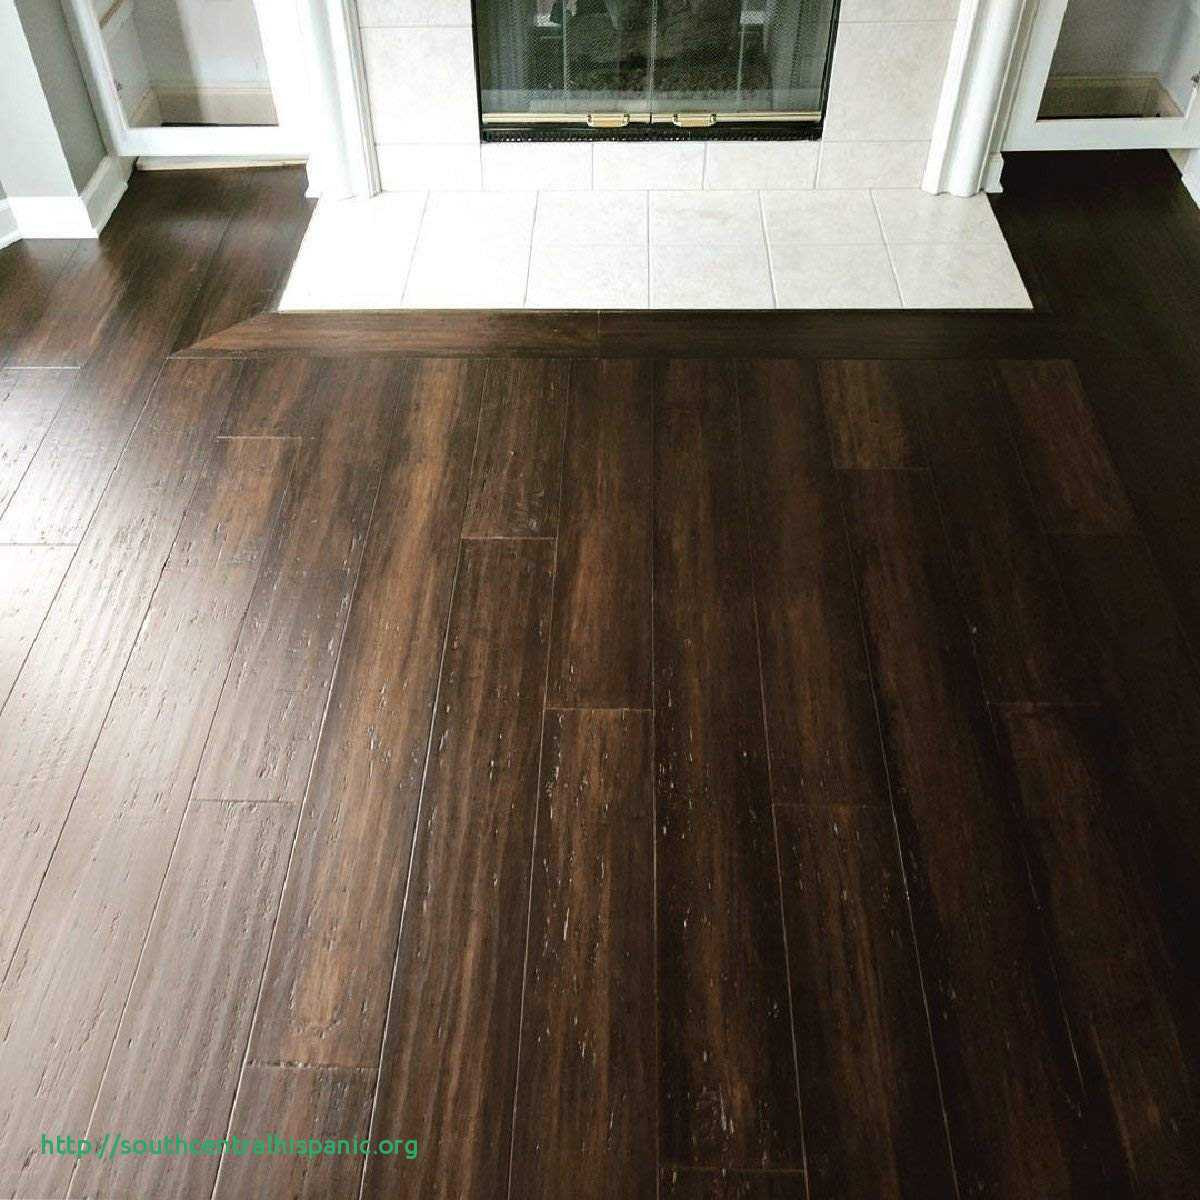 hardwood floor nailer rental of 16 meilleur de hardwood floor nailer rental ideas blog throughout hardwood floor nailer rental frais cali bamboo extra wide tg engineered flooring malibu dark